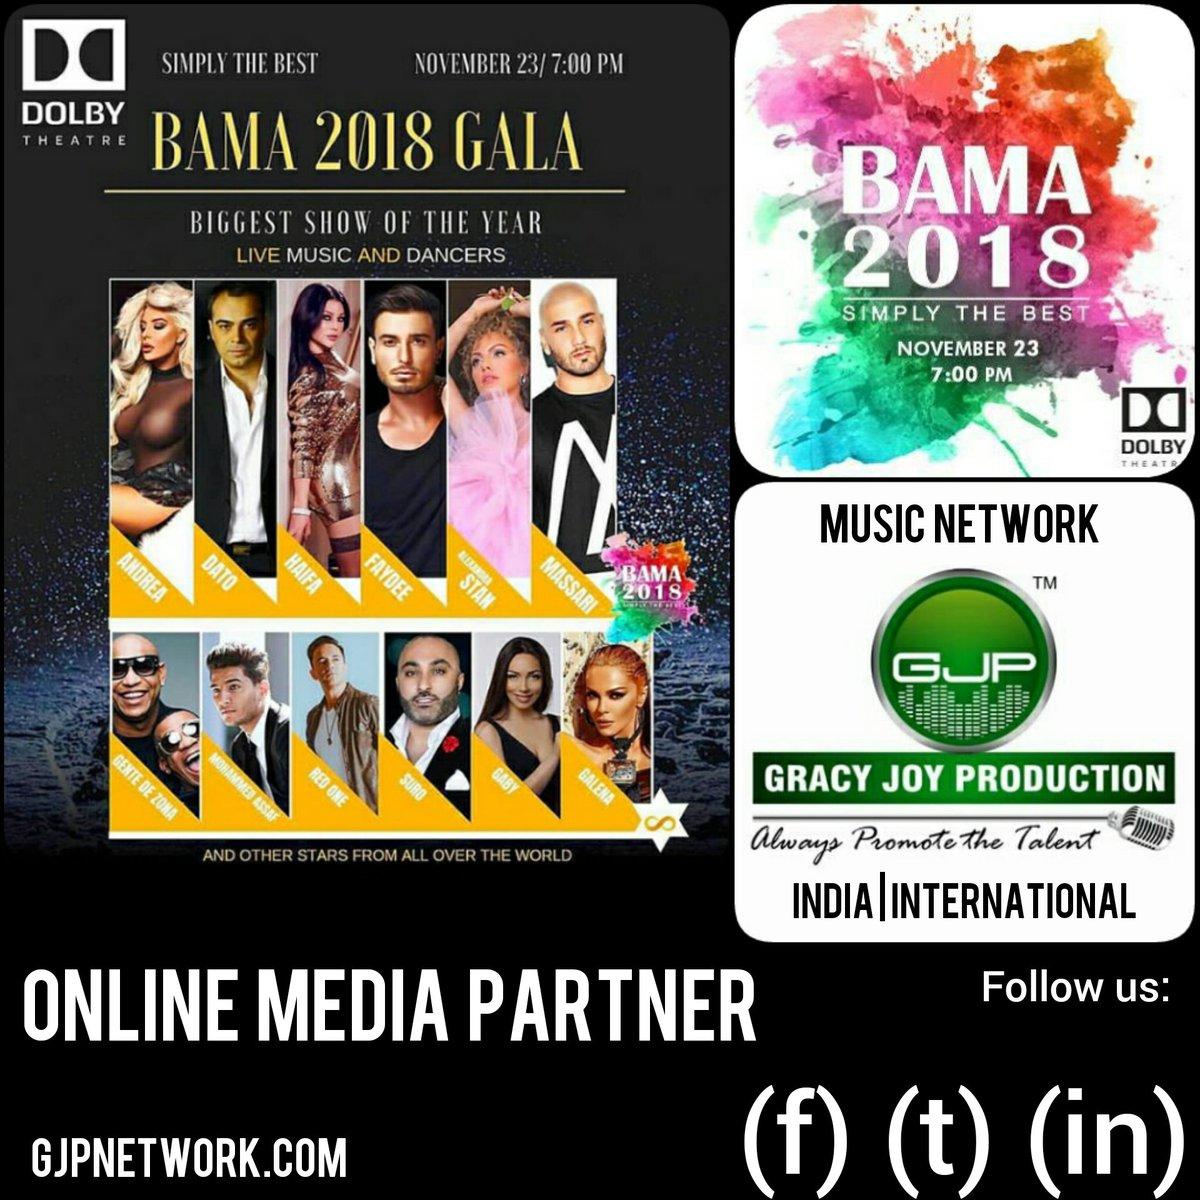 test Twitter Media - GRACY JOY PRODUCTION™ (@GJP_recordz) Official Online Media Partner International @BAMA_Official 2018 #USA #BAMA2018 / #Music / #Hollywood  (@BAMA_Official) 2018 23 - Nov. / 7:00 PM (@DolbyTheatre) / #LosAngeles  More info & tickets 👇 https://t.co/2IYjKOxp6q Via (@Ticketmaster) https://t.co/adg8sz9VsG